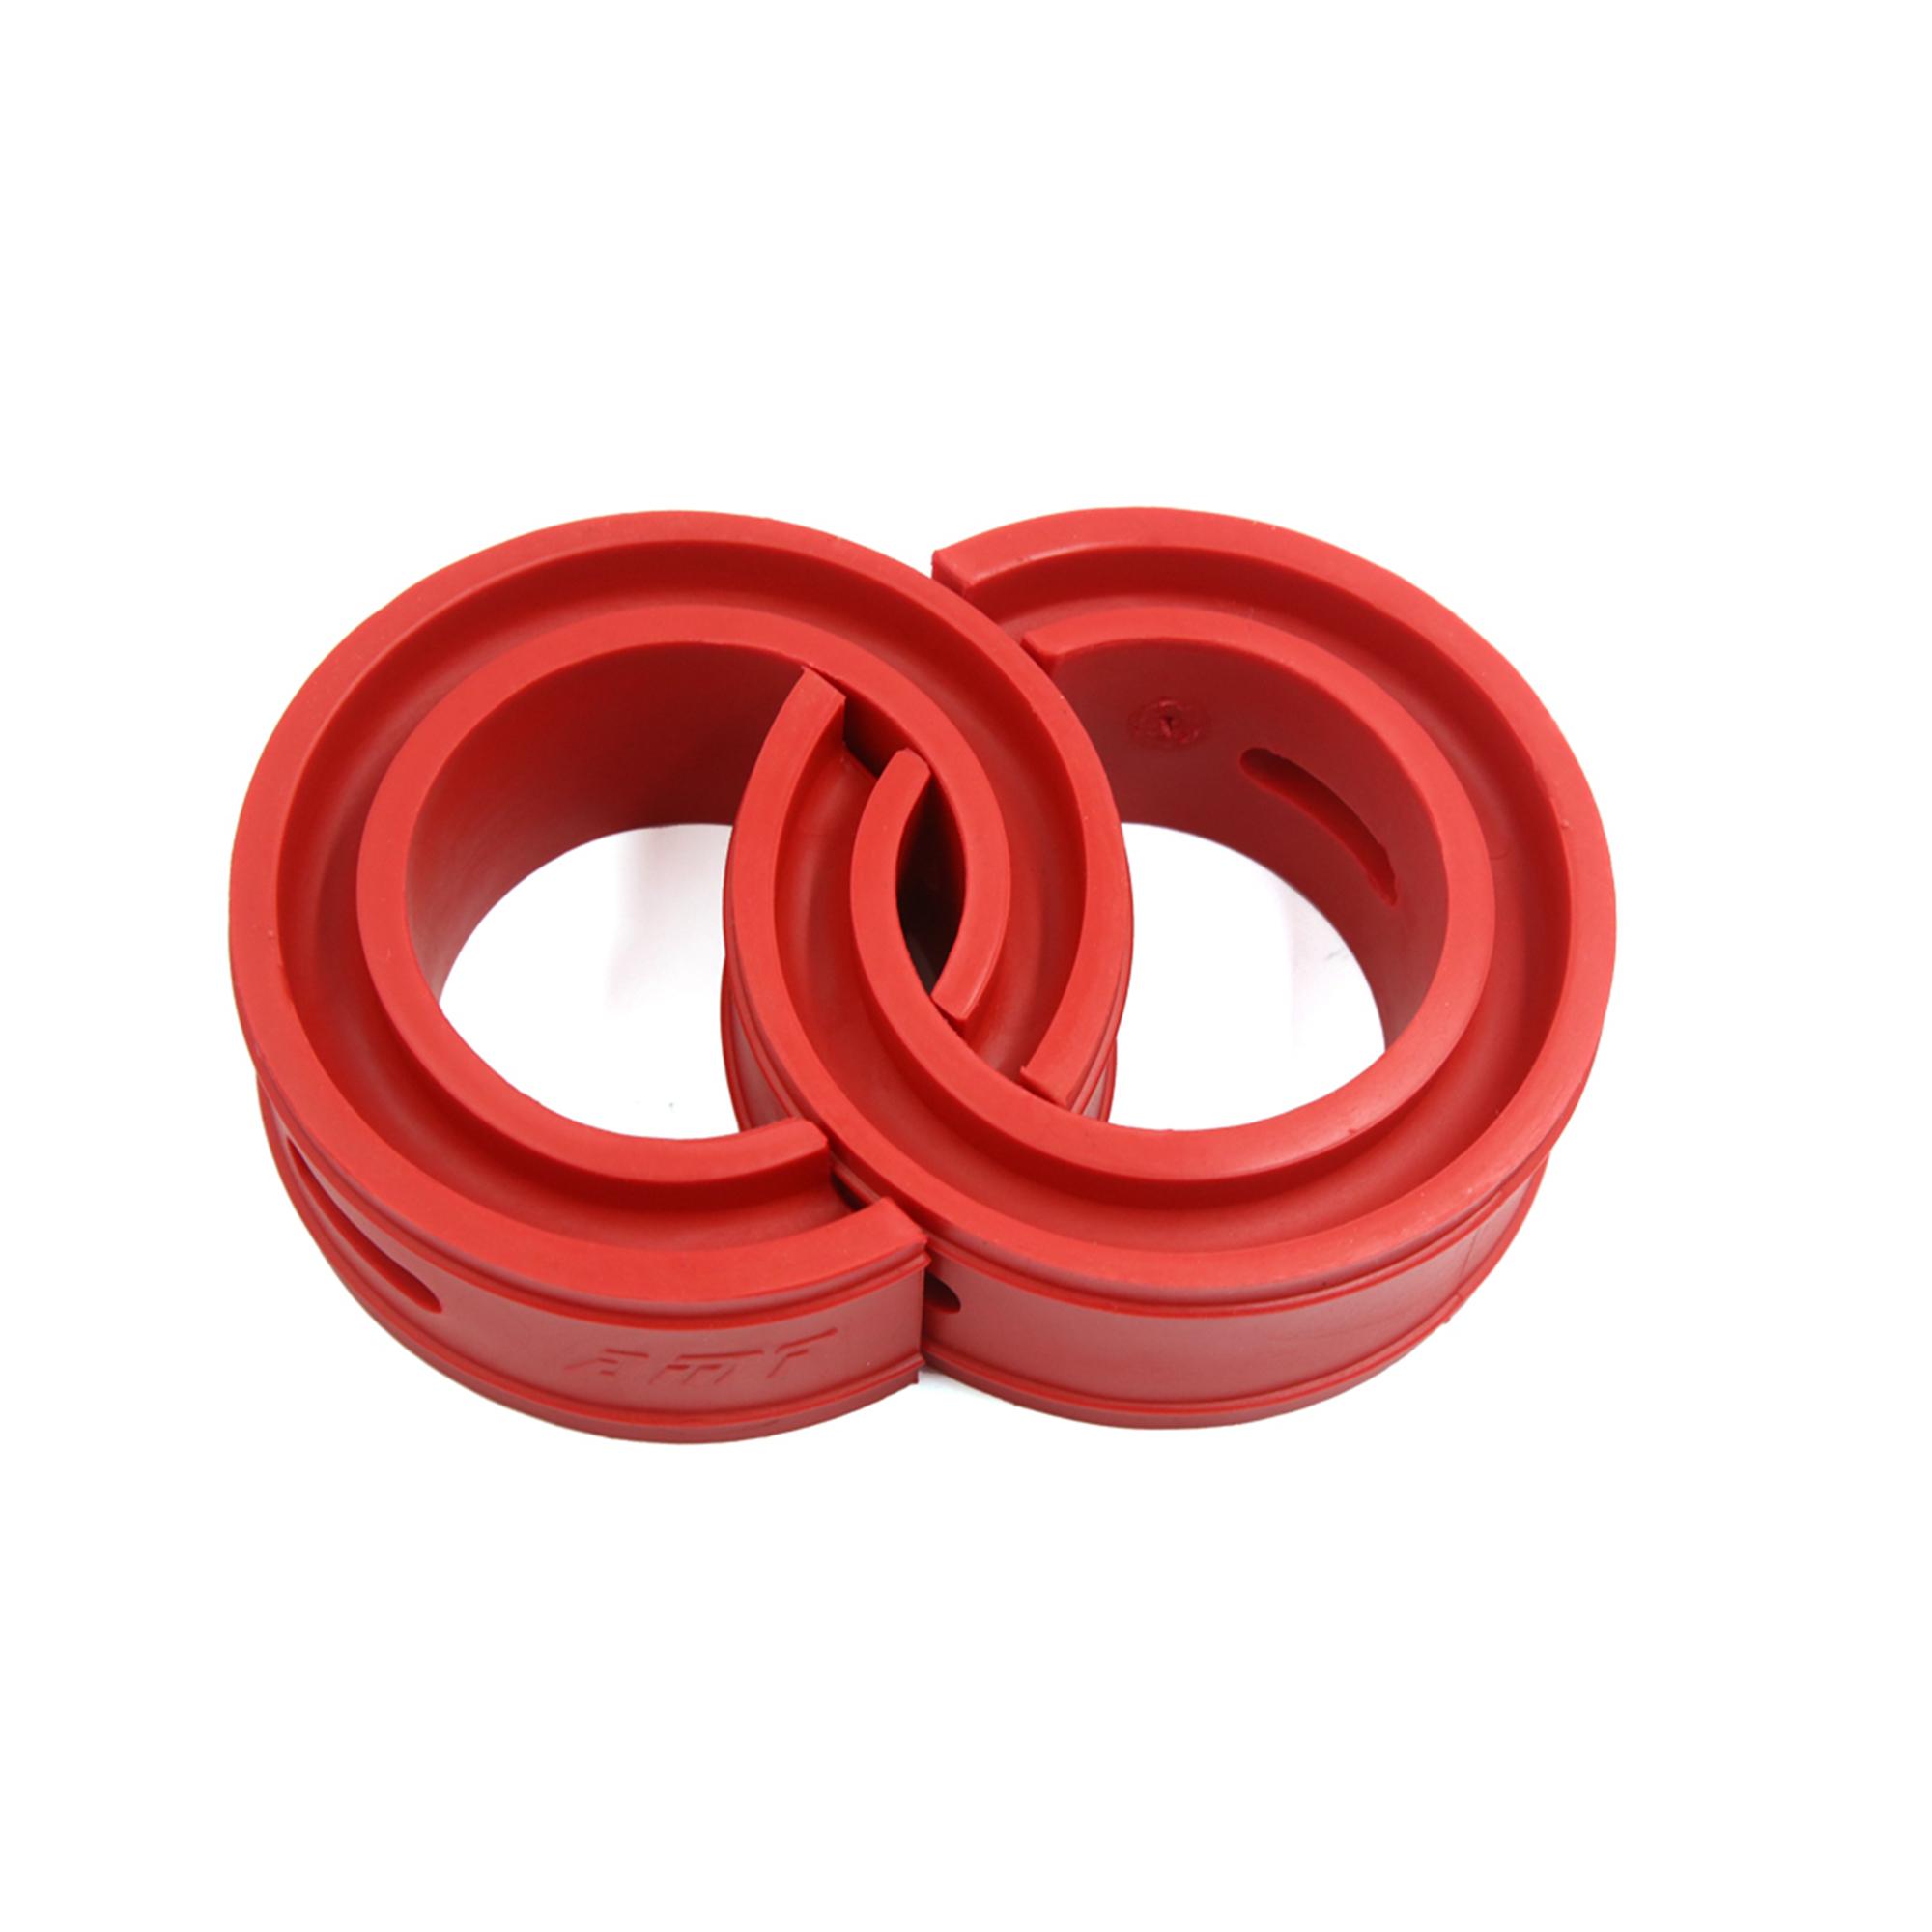 Type-D Red Car Rubber Shock Absorber Spring Bumper Buffer Power Cushion 2pcs